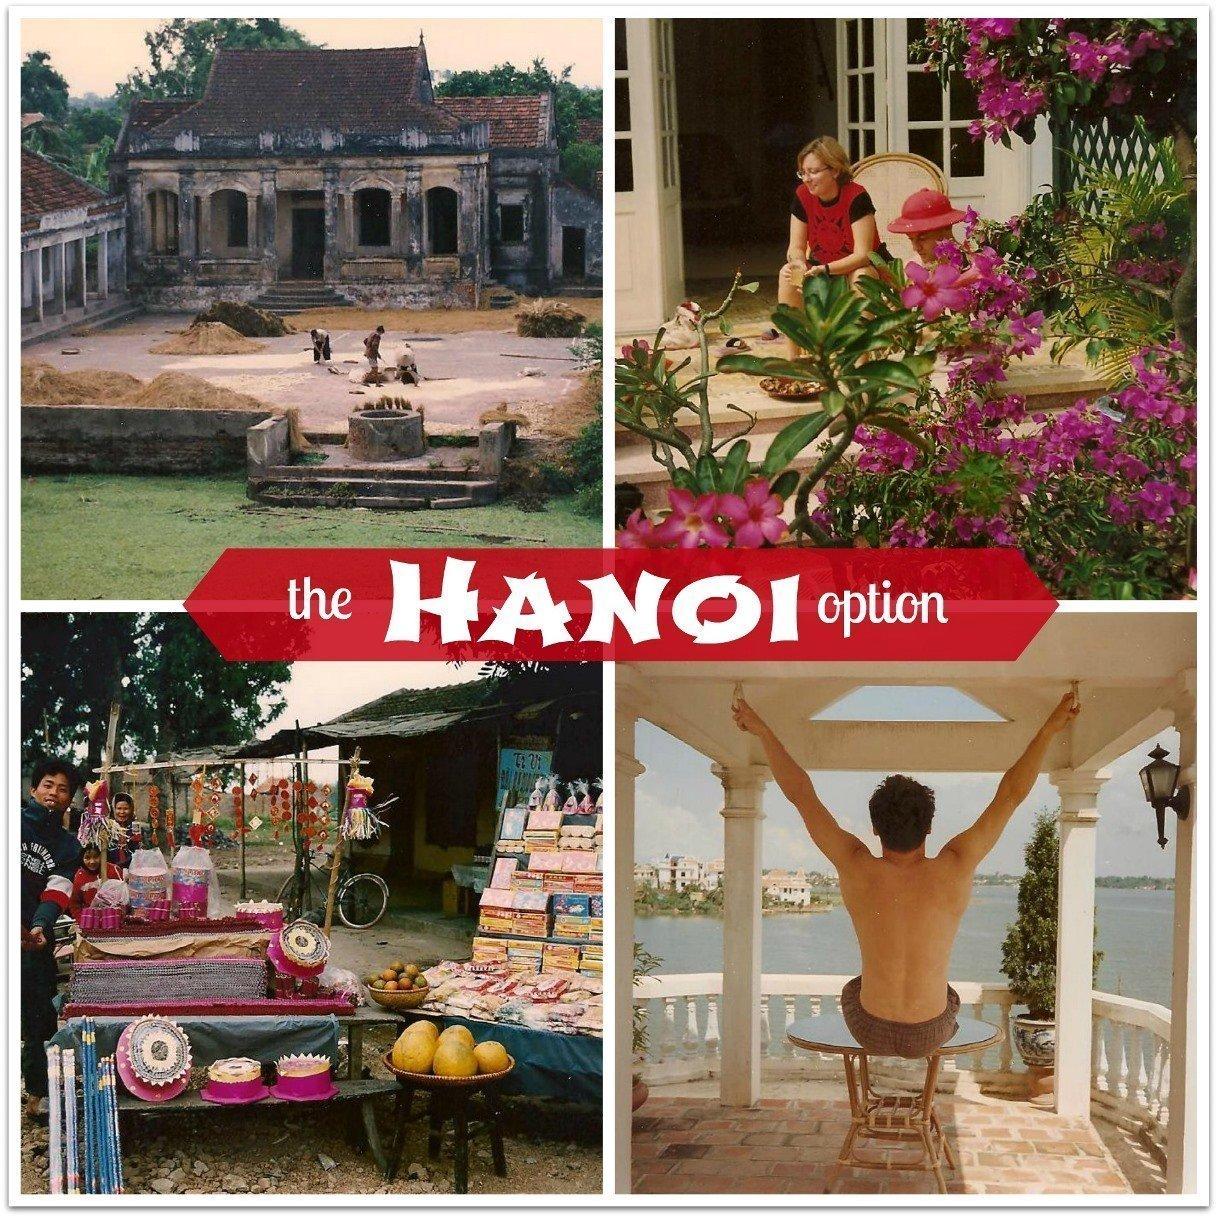 Hanoi option for wedding